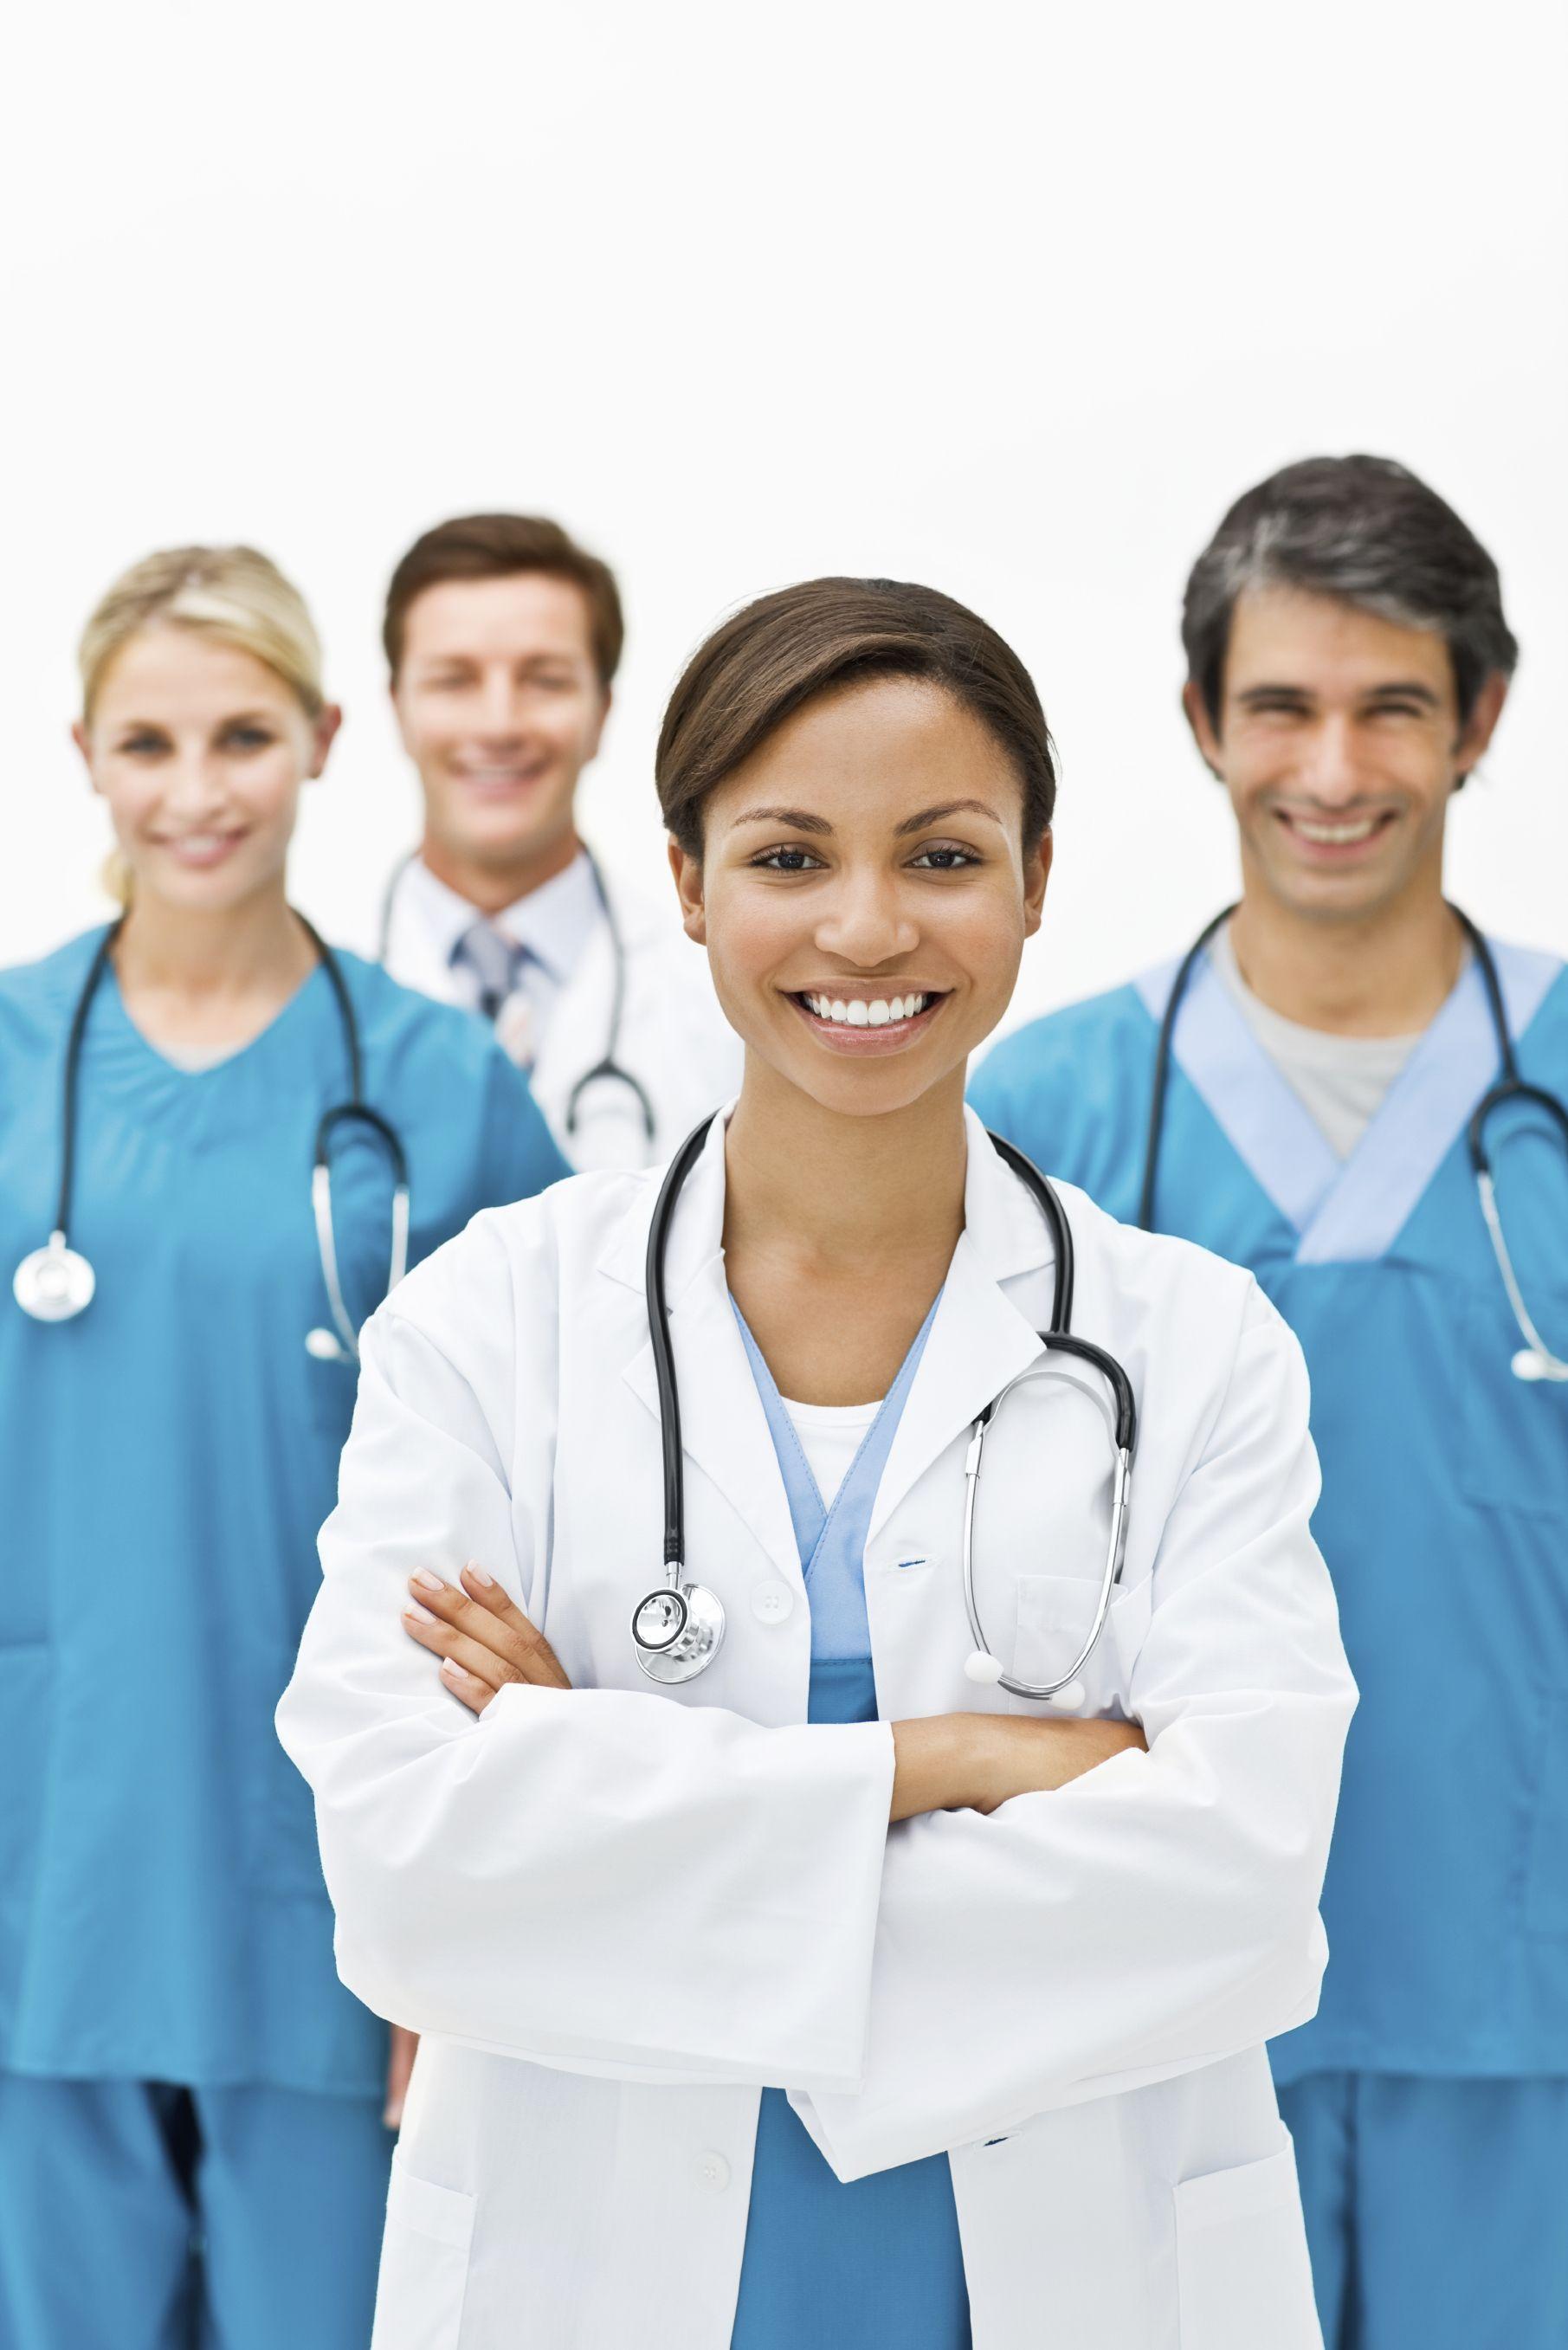 Single medical professionals